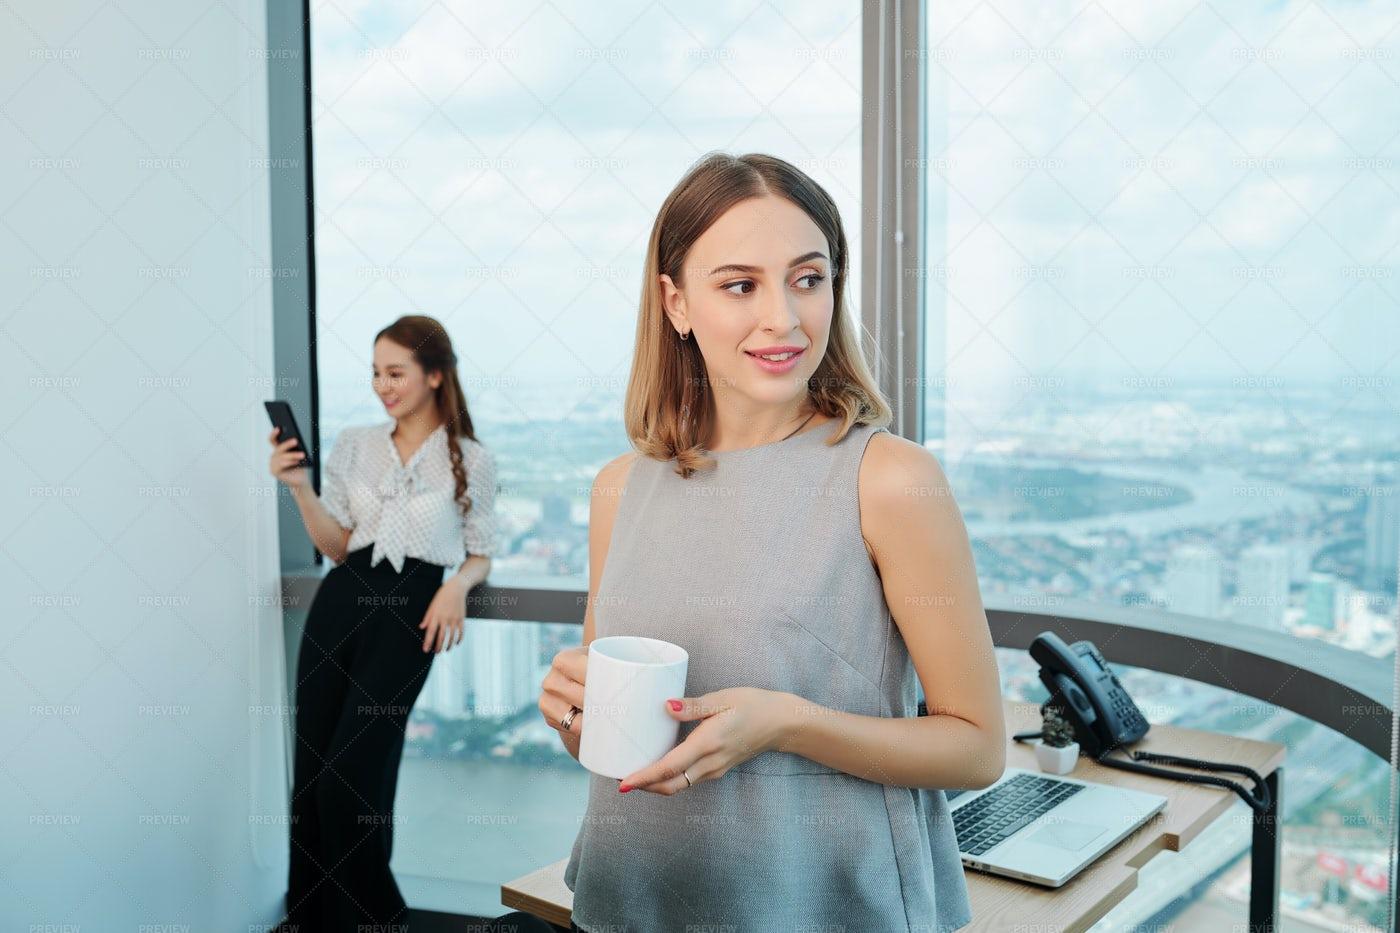 Business Lady With Mug Of Coffee: Stock Photos